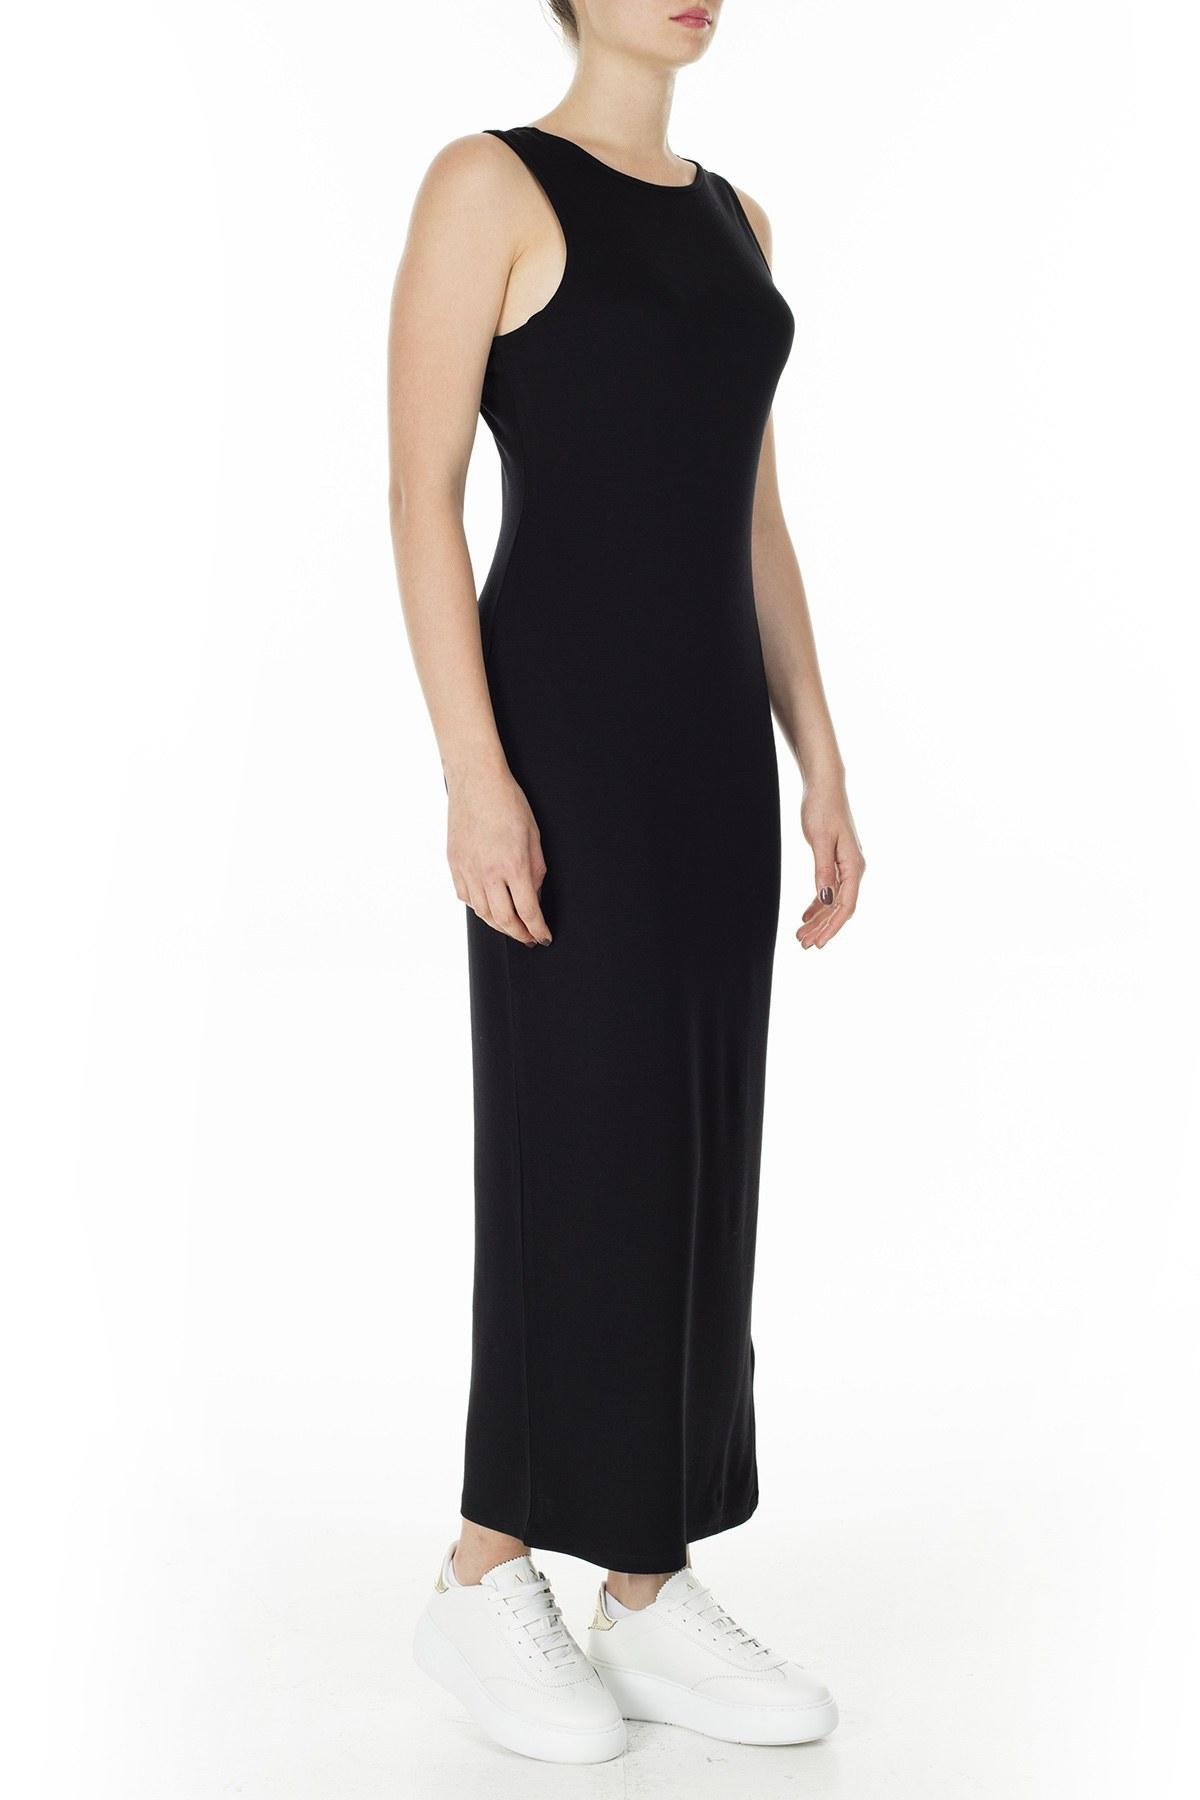 Armani Exchange Kadın Elbise S 6GYA91 YJB3Z 1200 SİYAH